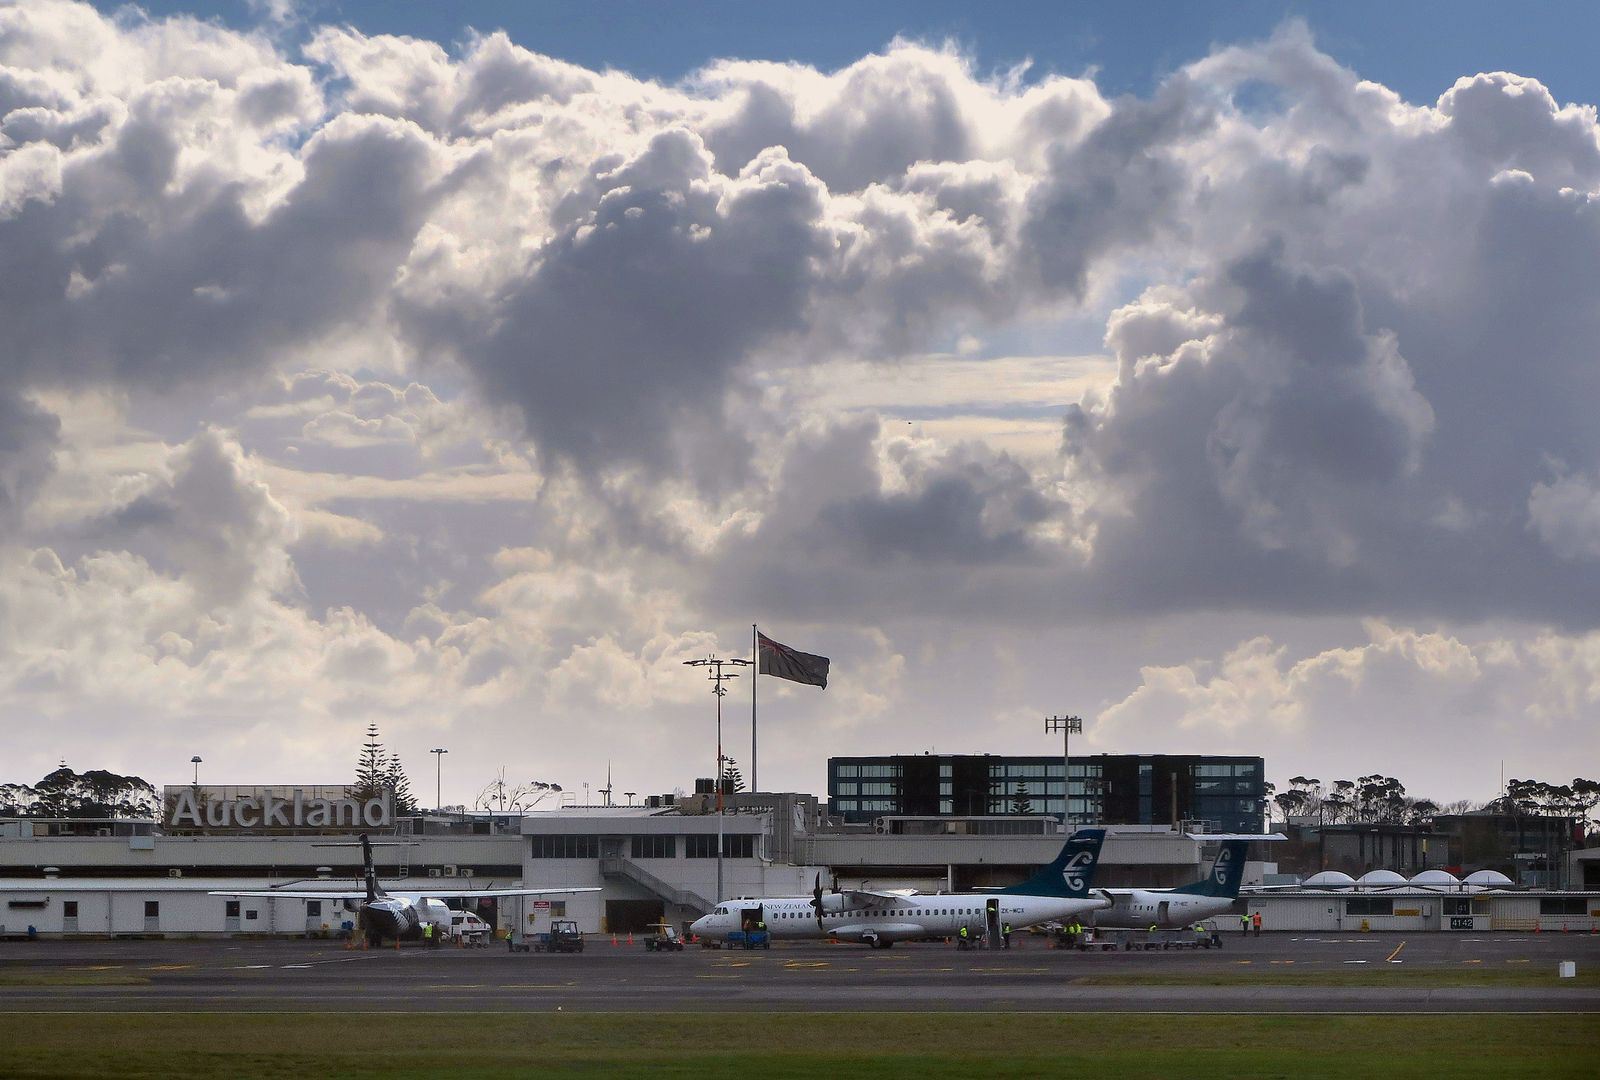 Airport Auckland/ Neuseeland/ Flughafen